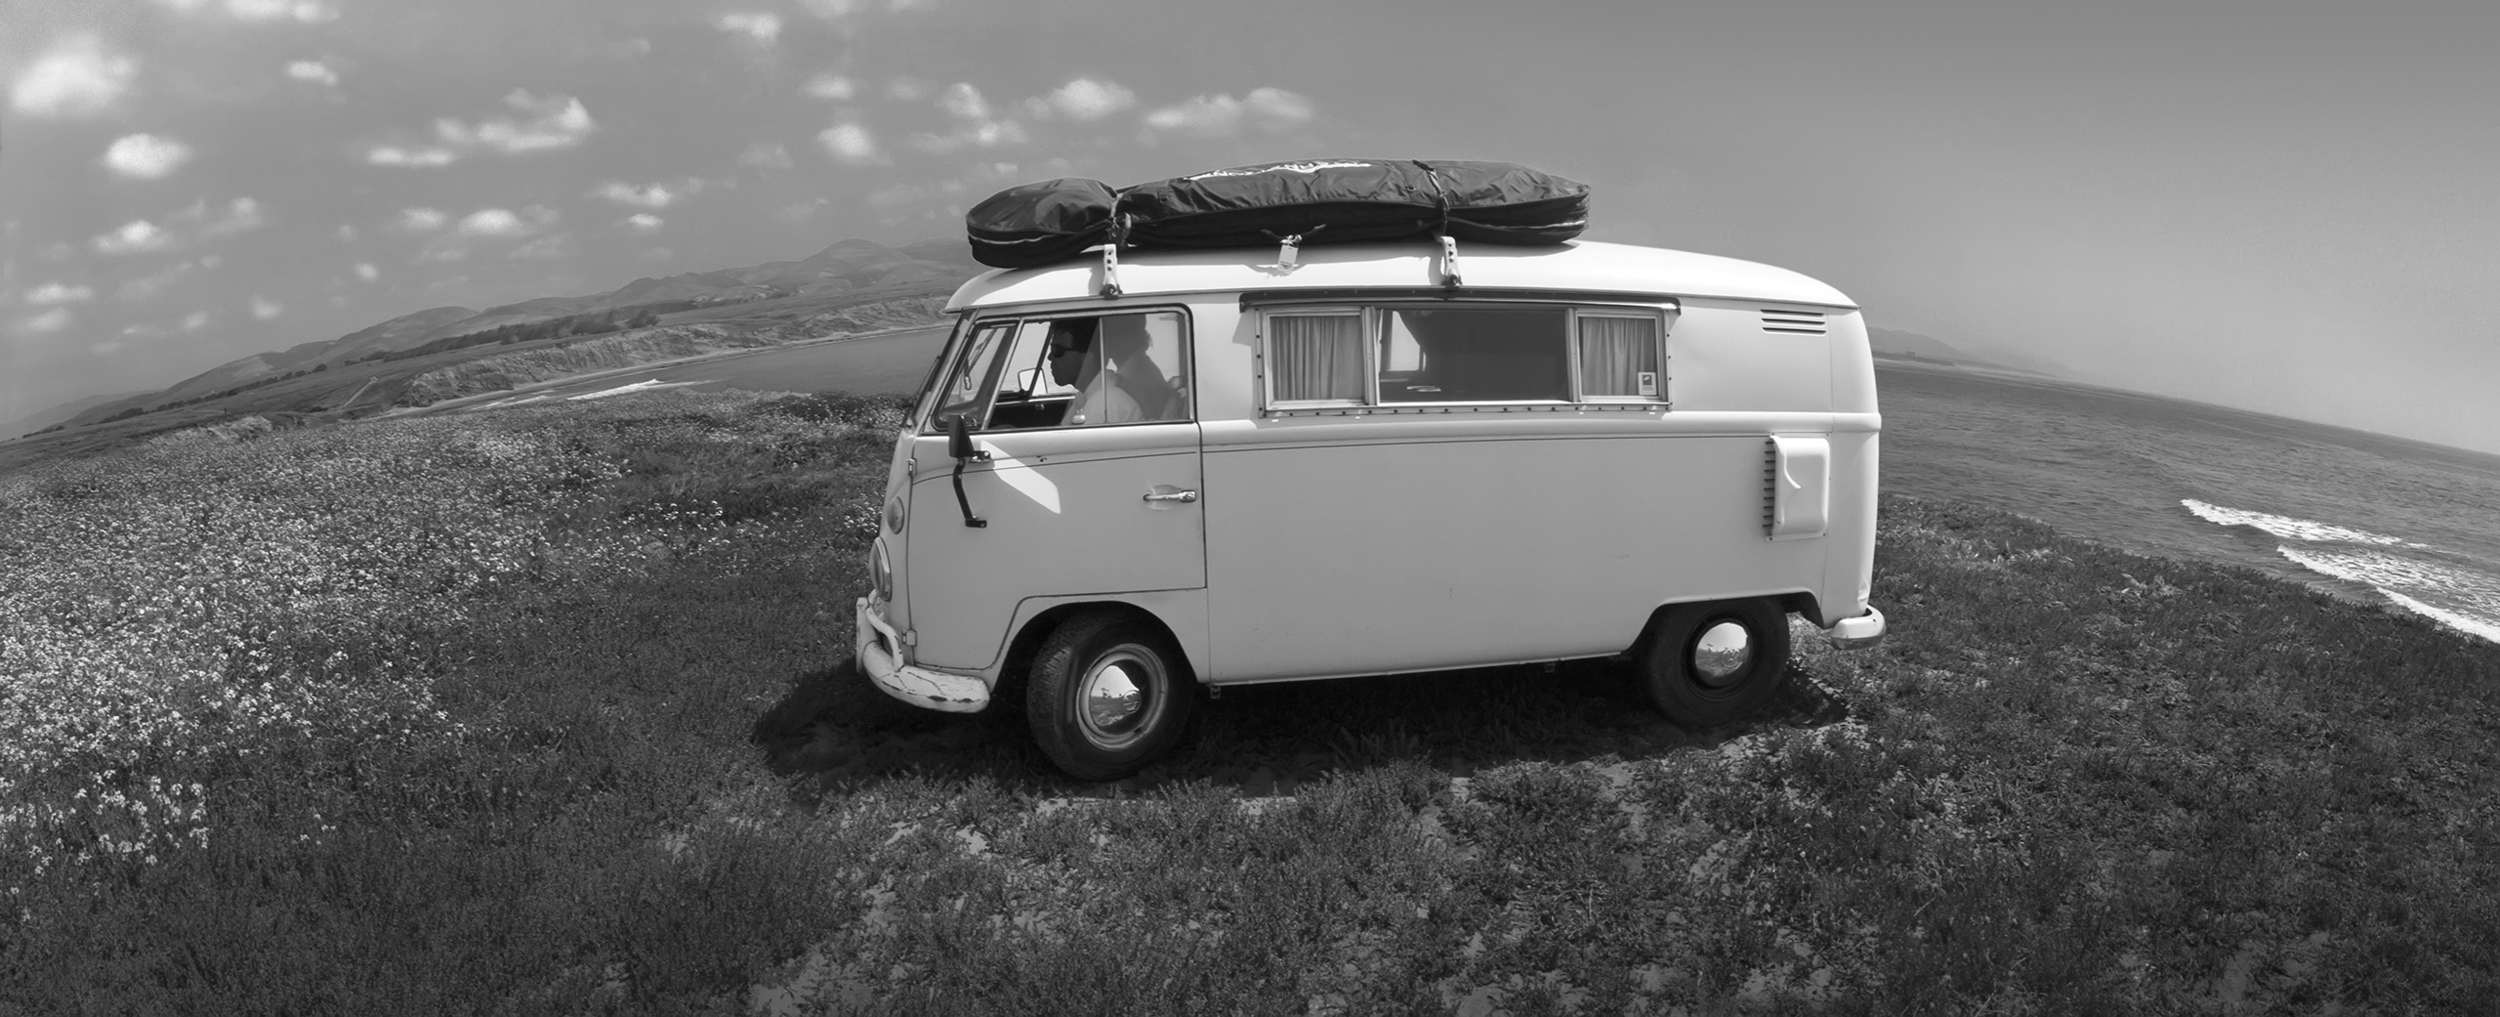 '66 microbus @Cojo